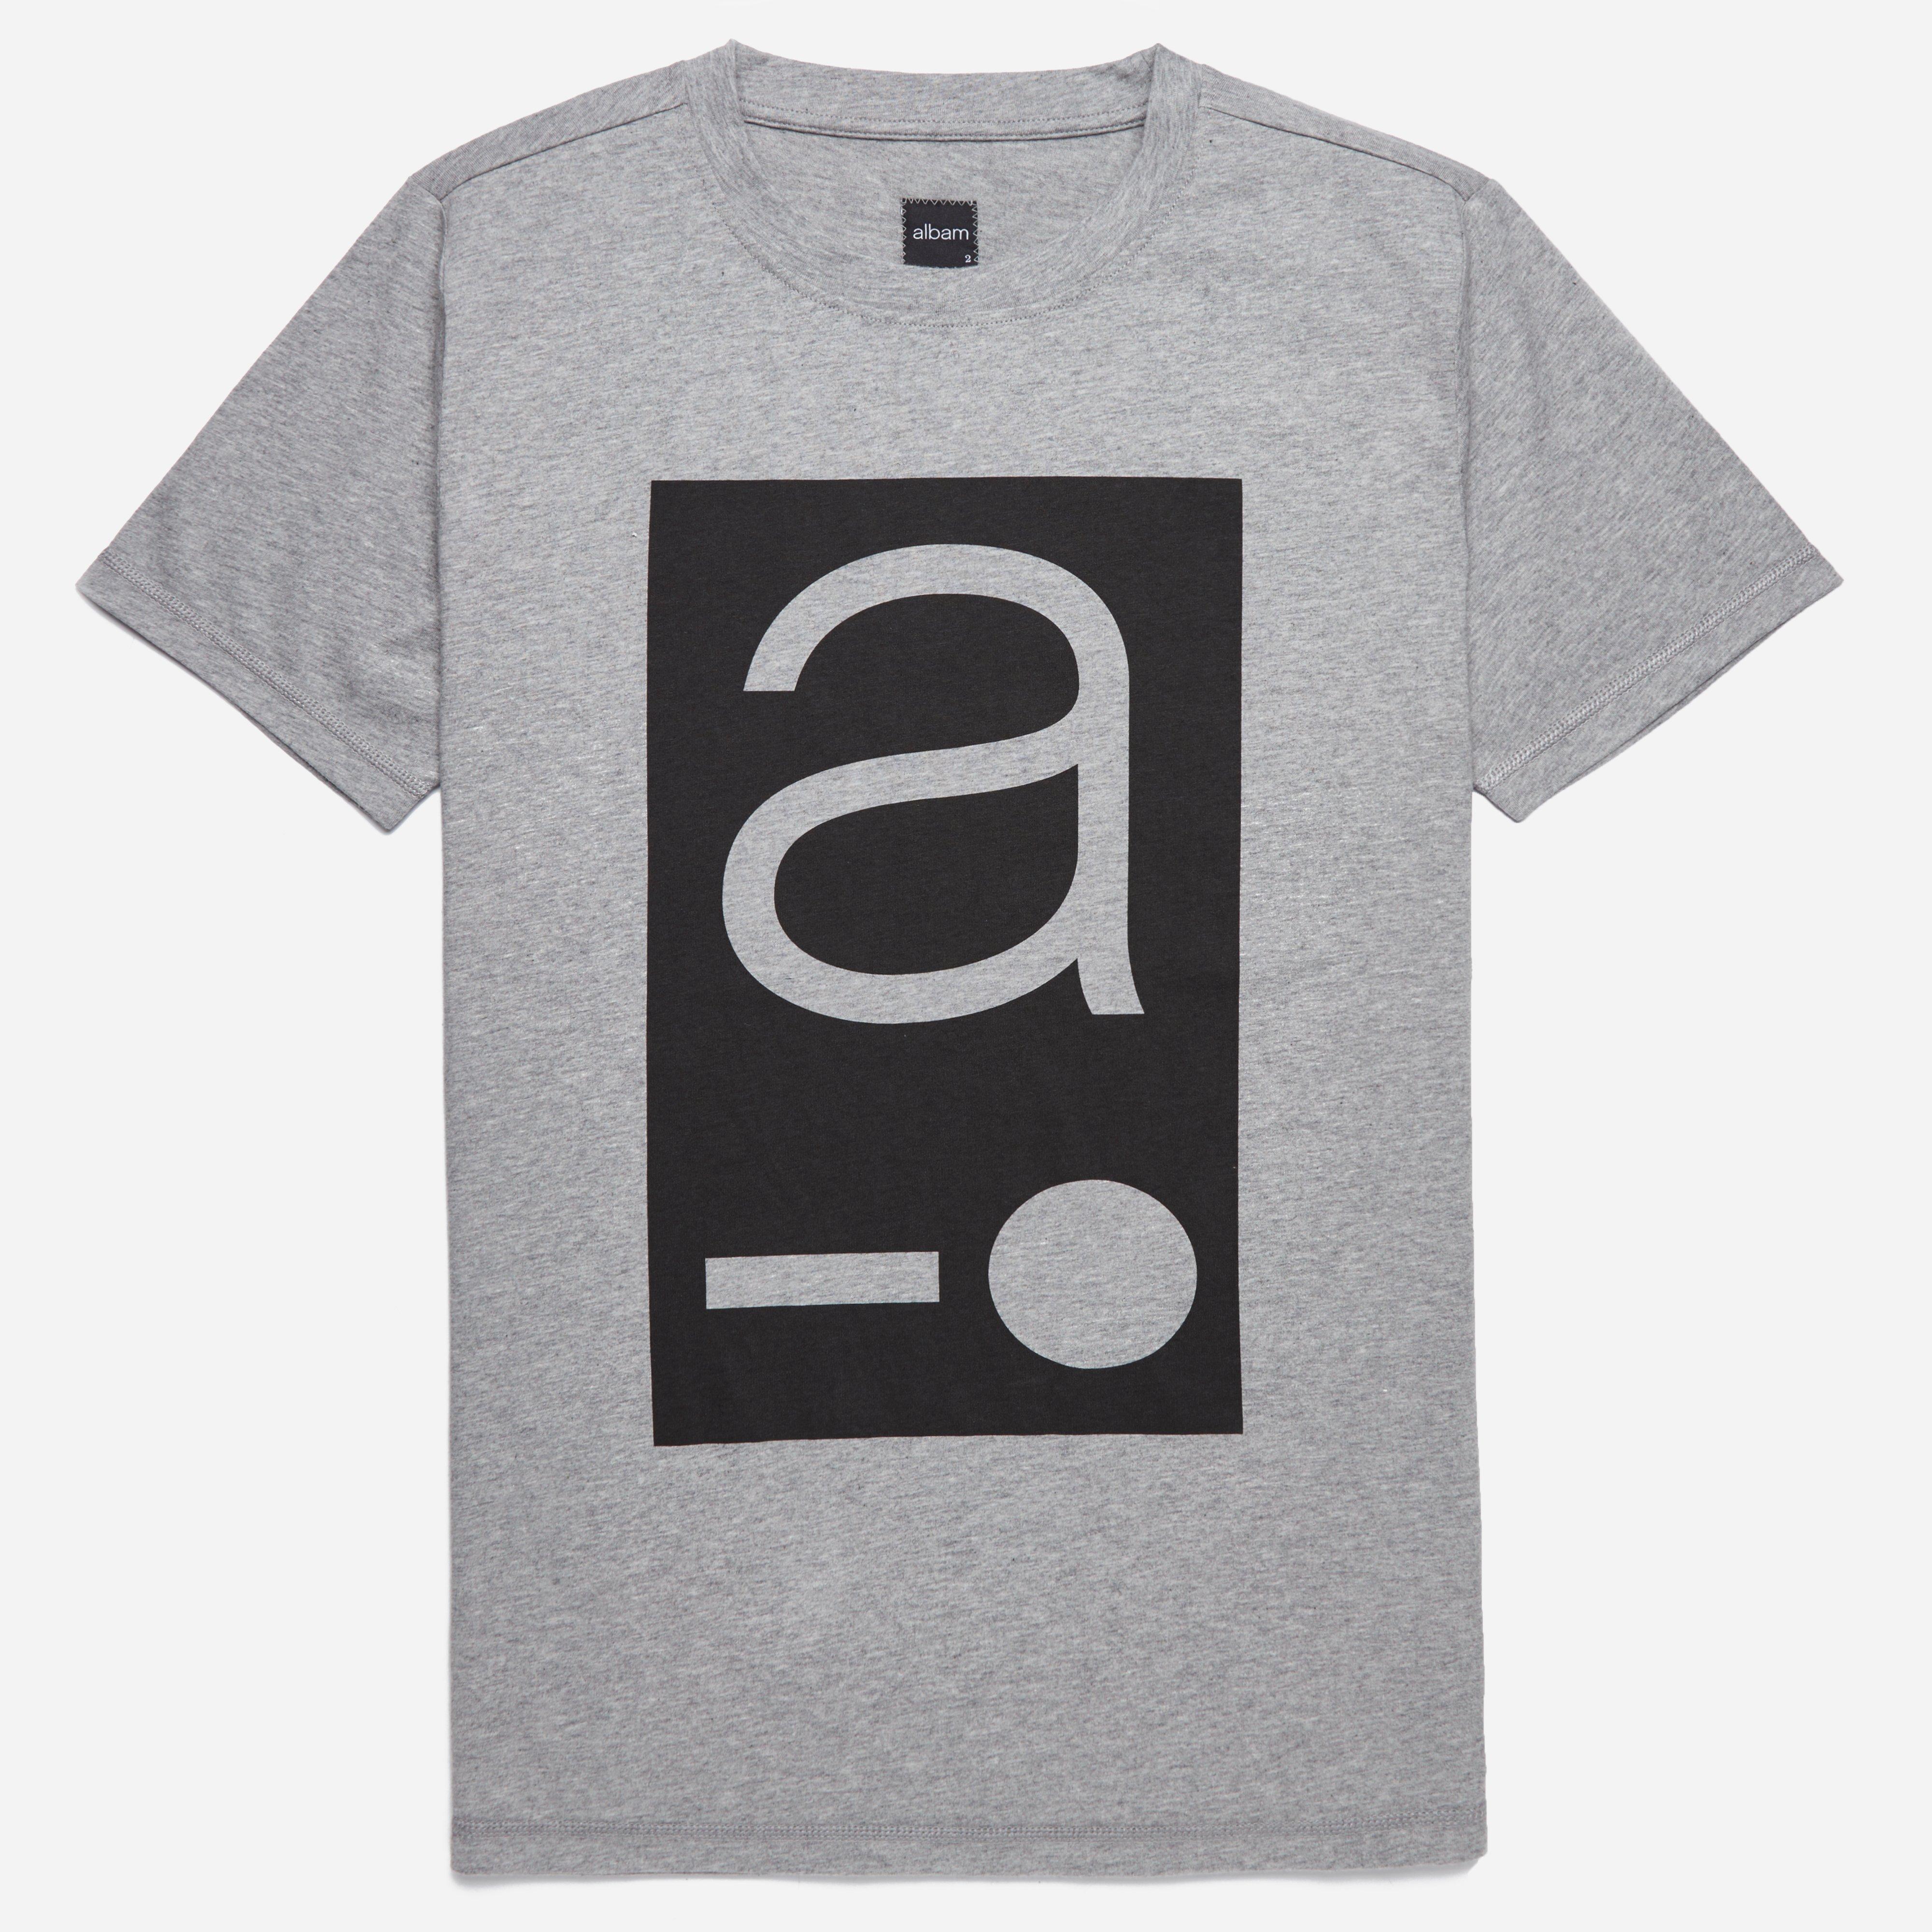 Albam Code Logo T-shirt